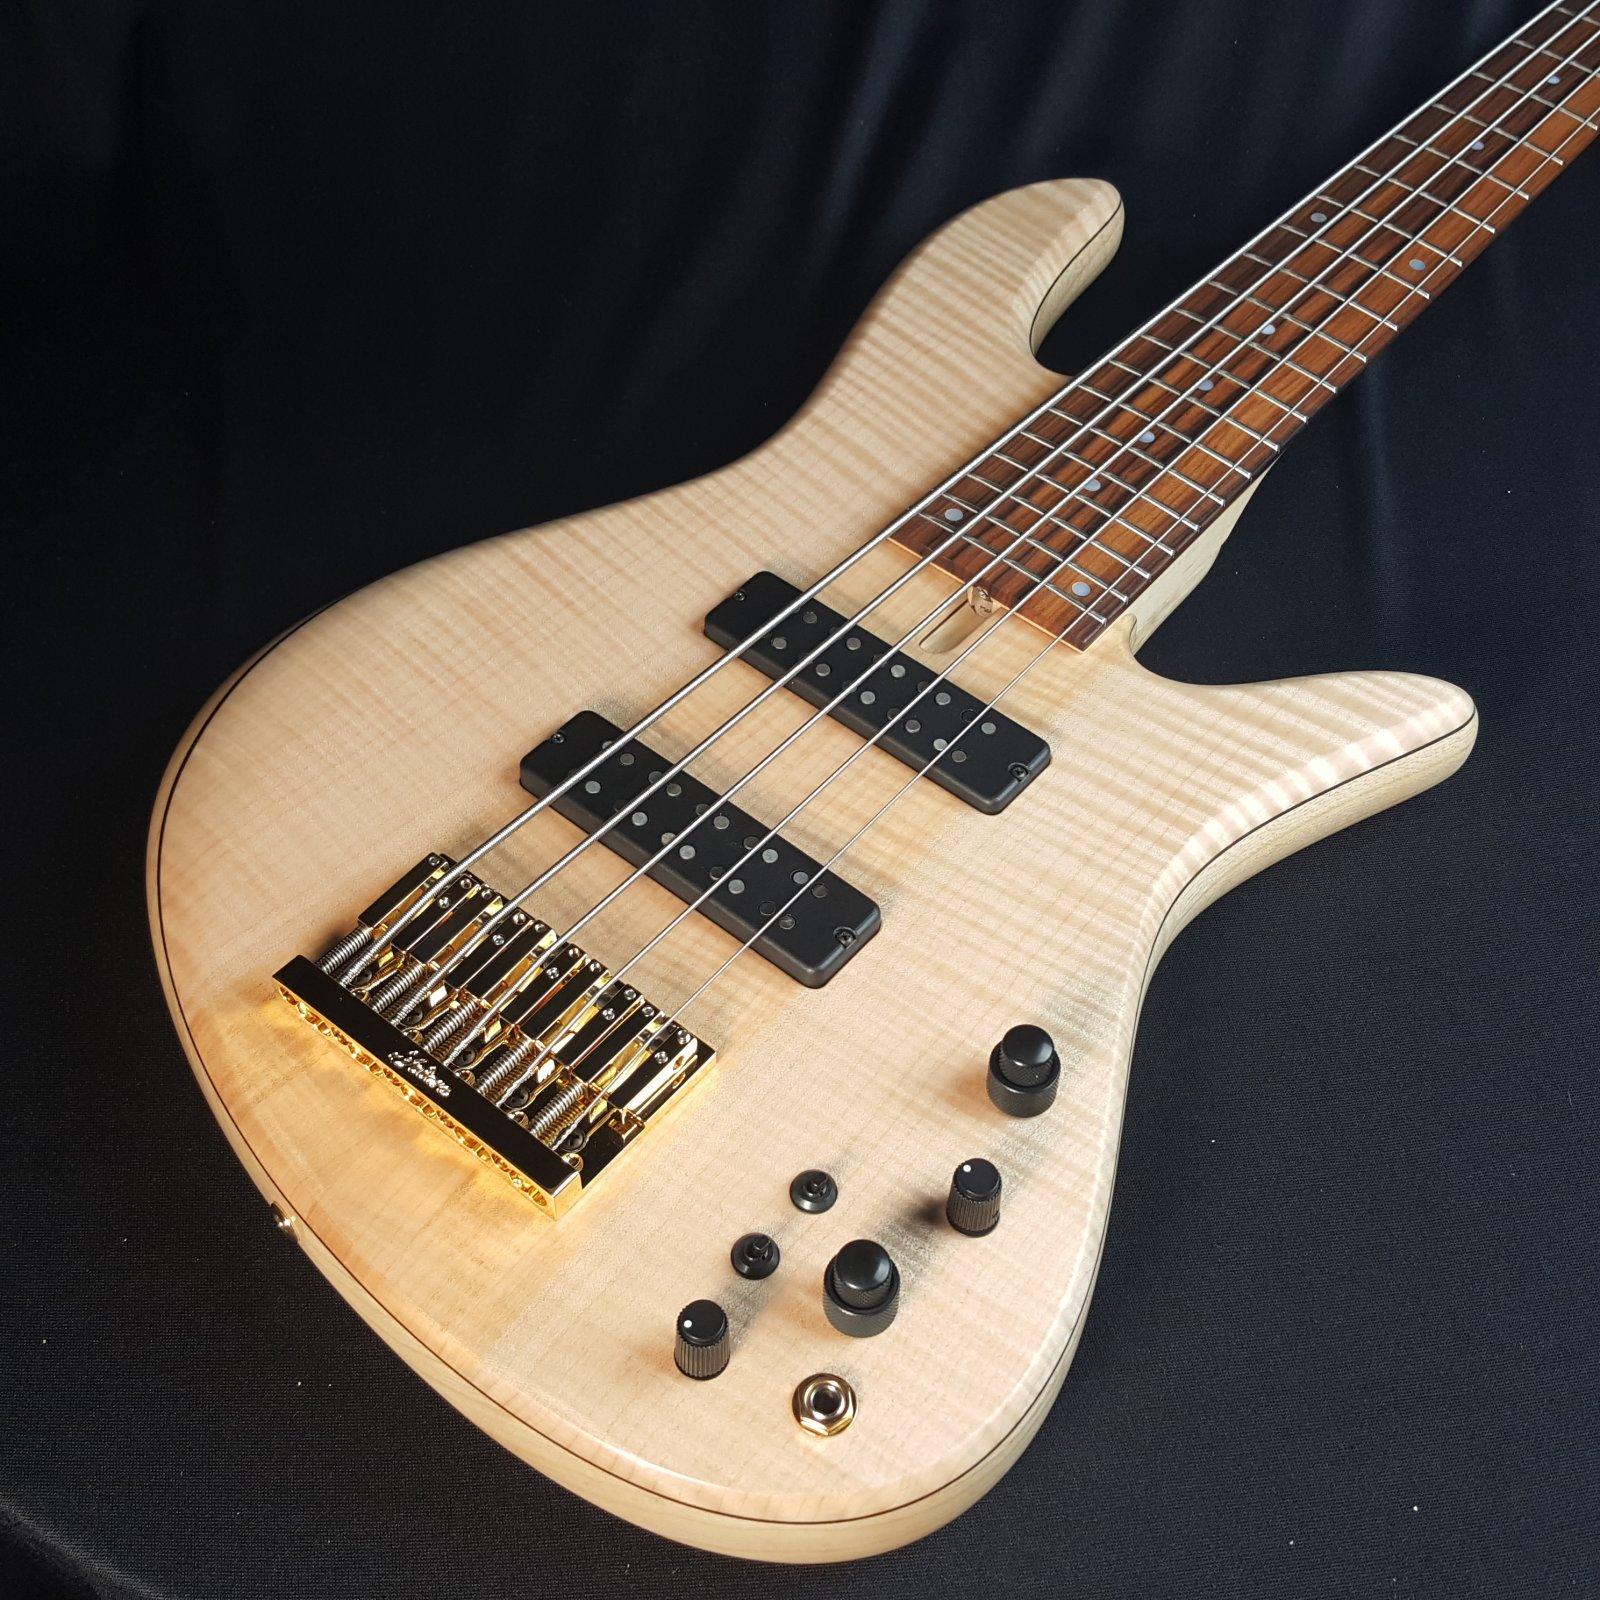 Fodera Emperor Standard 5 String Bass With Case 9lb 5oz